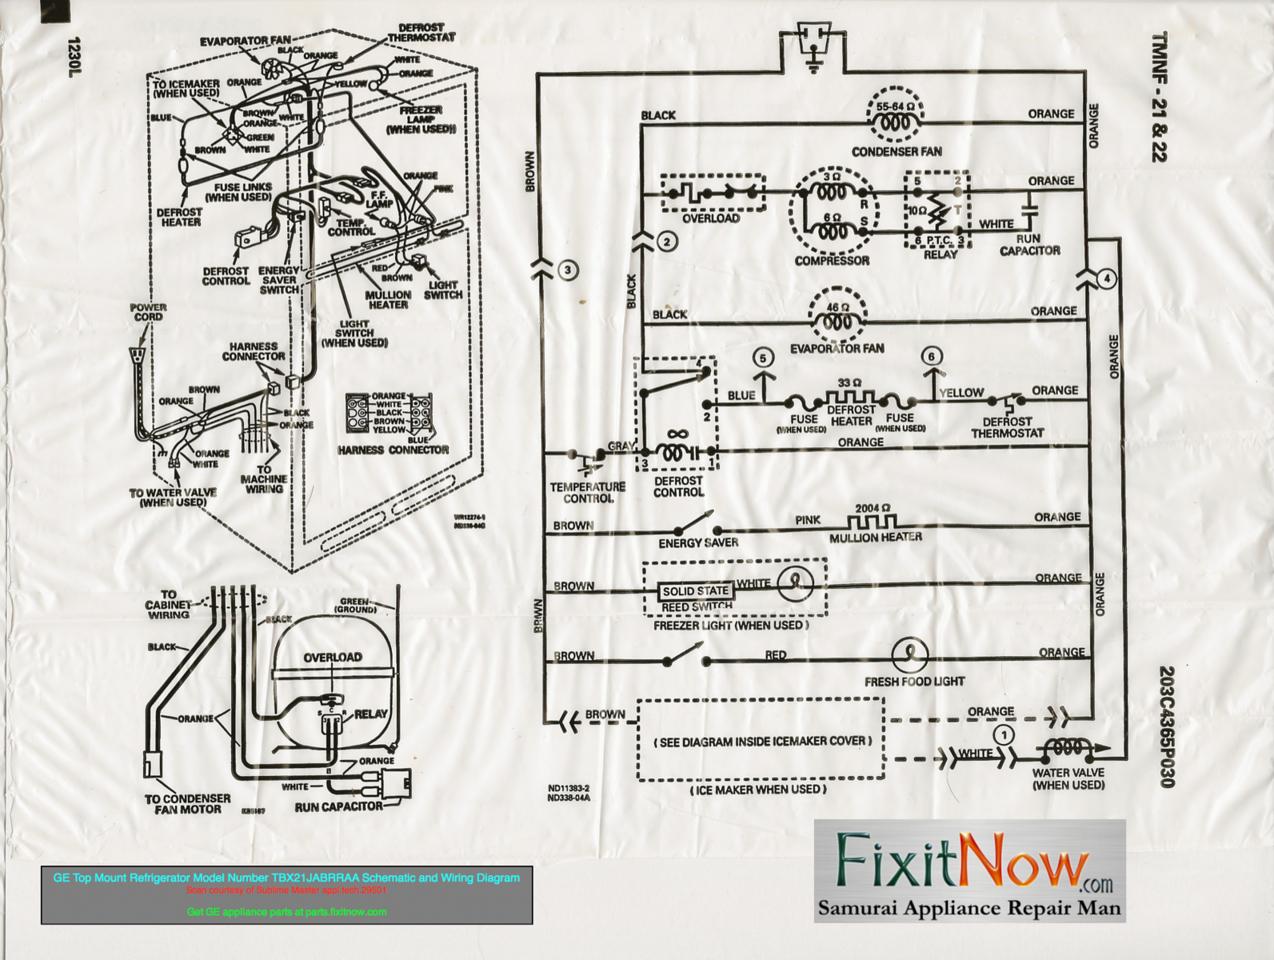 Ge Monogram Wiring Diagram | Schematic Diagram - Dryer Wiring Diagram